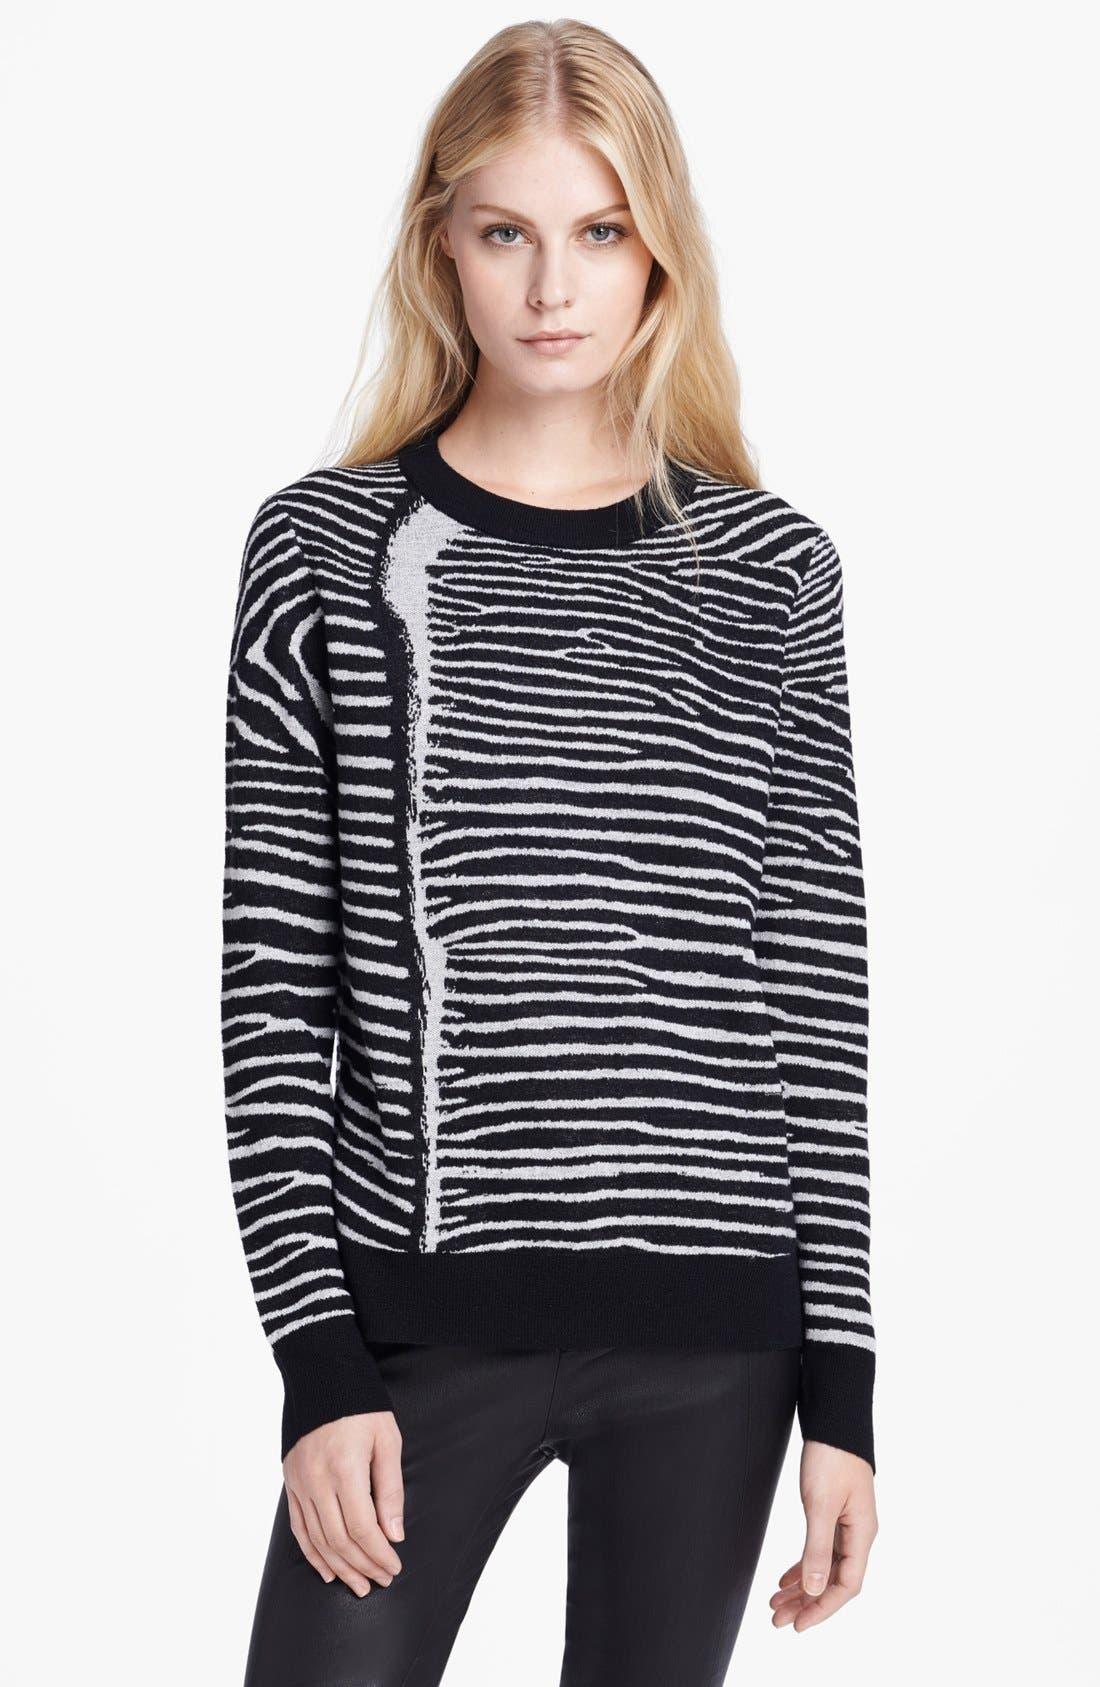 Alternate Image 1 Selected - A.L.C. 'Cayero' Sweater